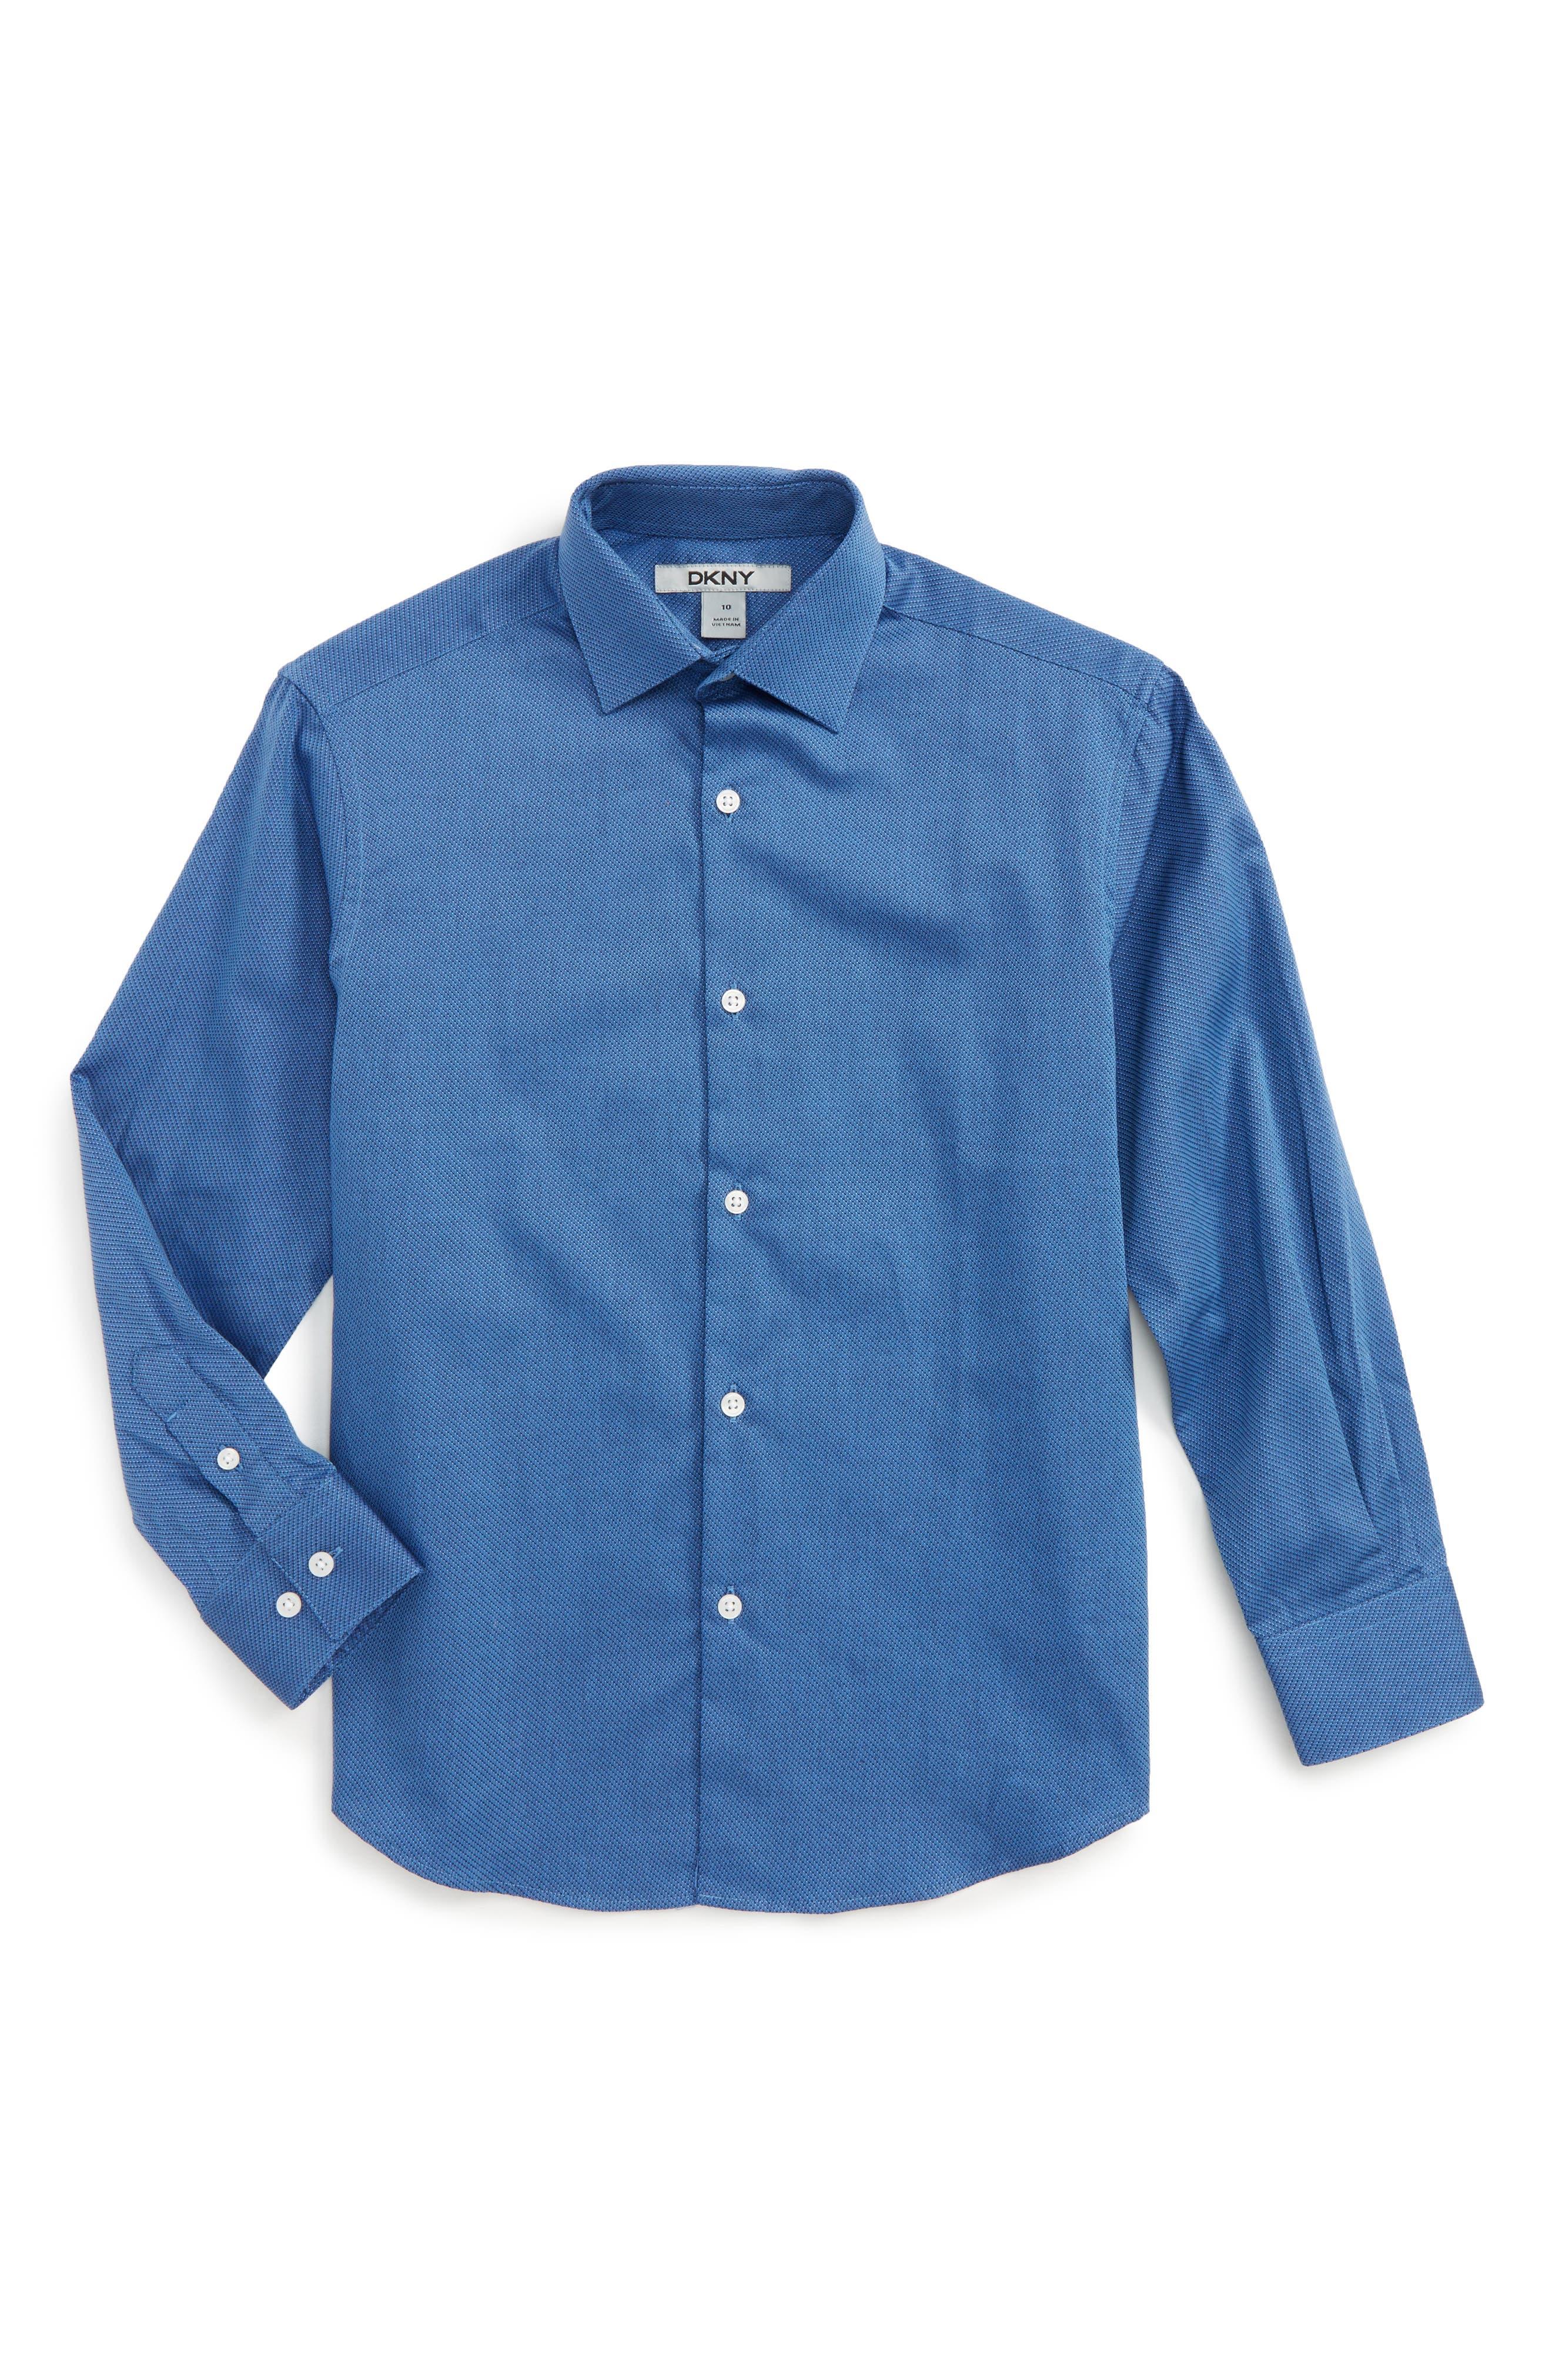 Main Image - DKNY Textured Dress Shirt (Big Boys)